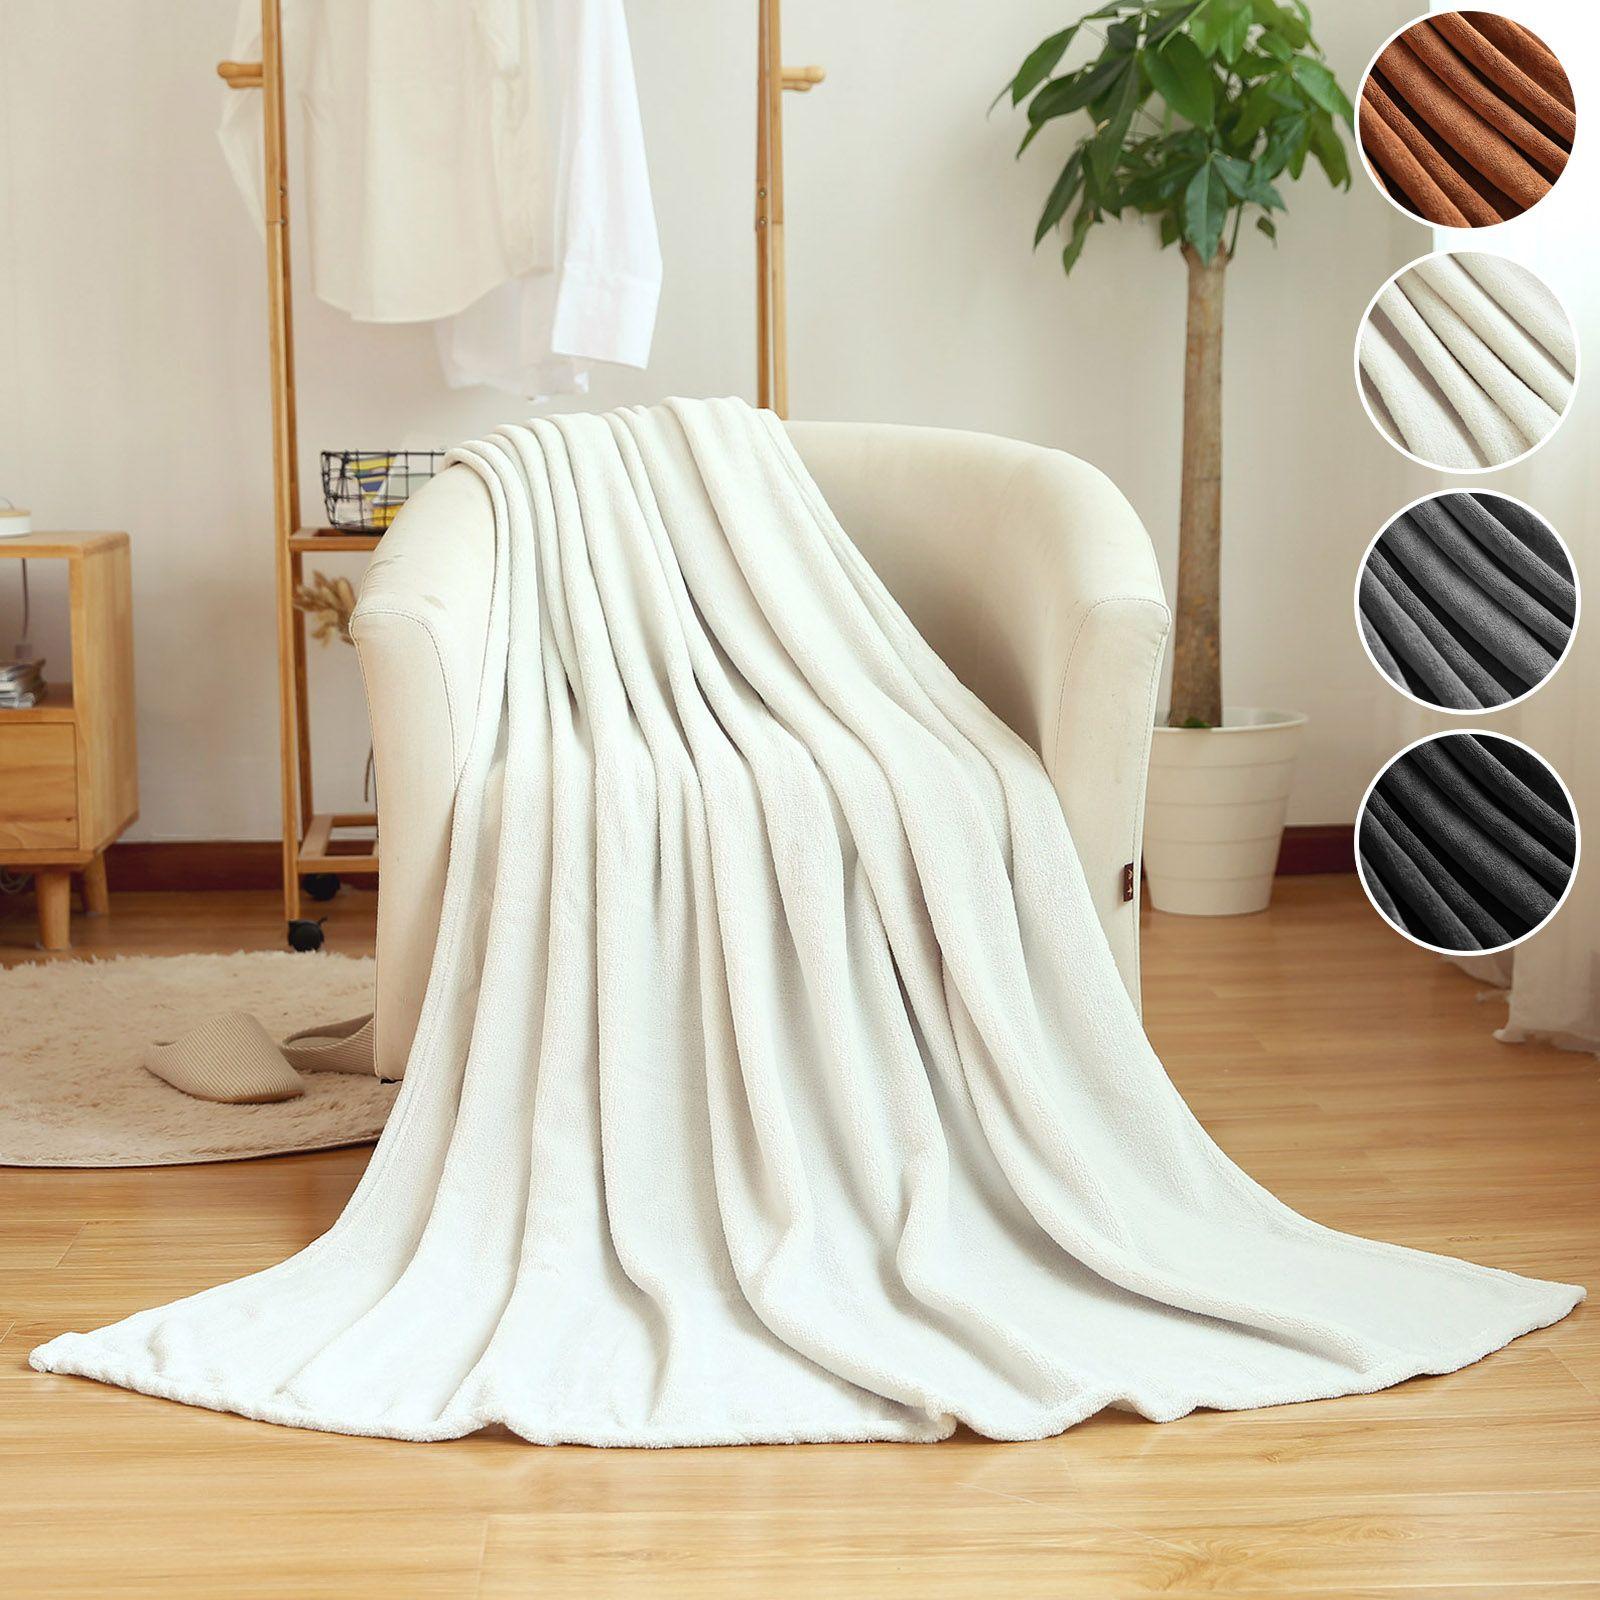 Woltu Kuscheldecke Wohndecke Tv Decke Tagesdecke Sofadecke Bettdecke Microfaserddecke Flanelle Fleece Decke Xl 150x200 Cm 220x240 Cm Blanket Throw Blanket Bed